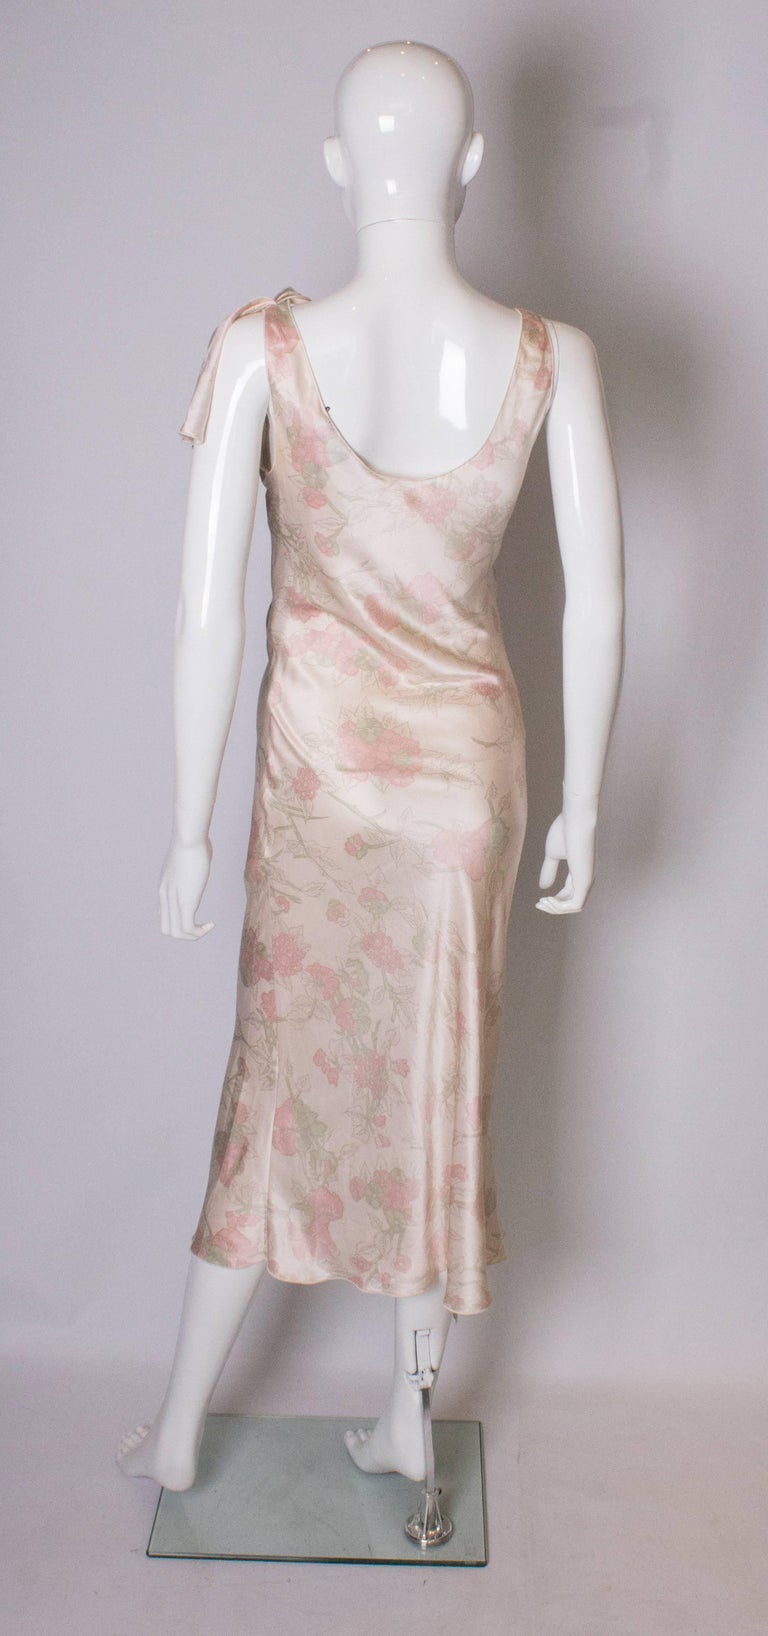 Vintage Ungaro Silk Slip Dress or Nightdress For Sale 2